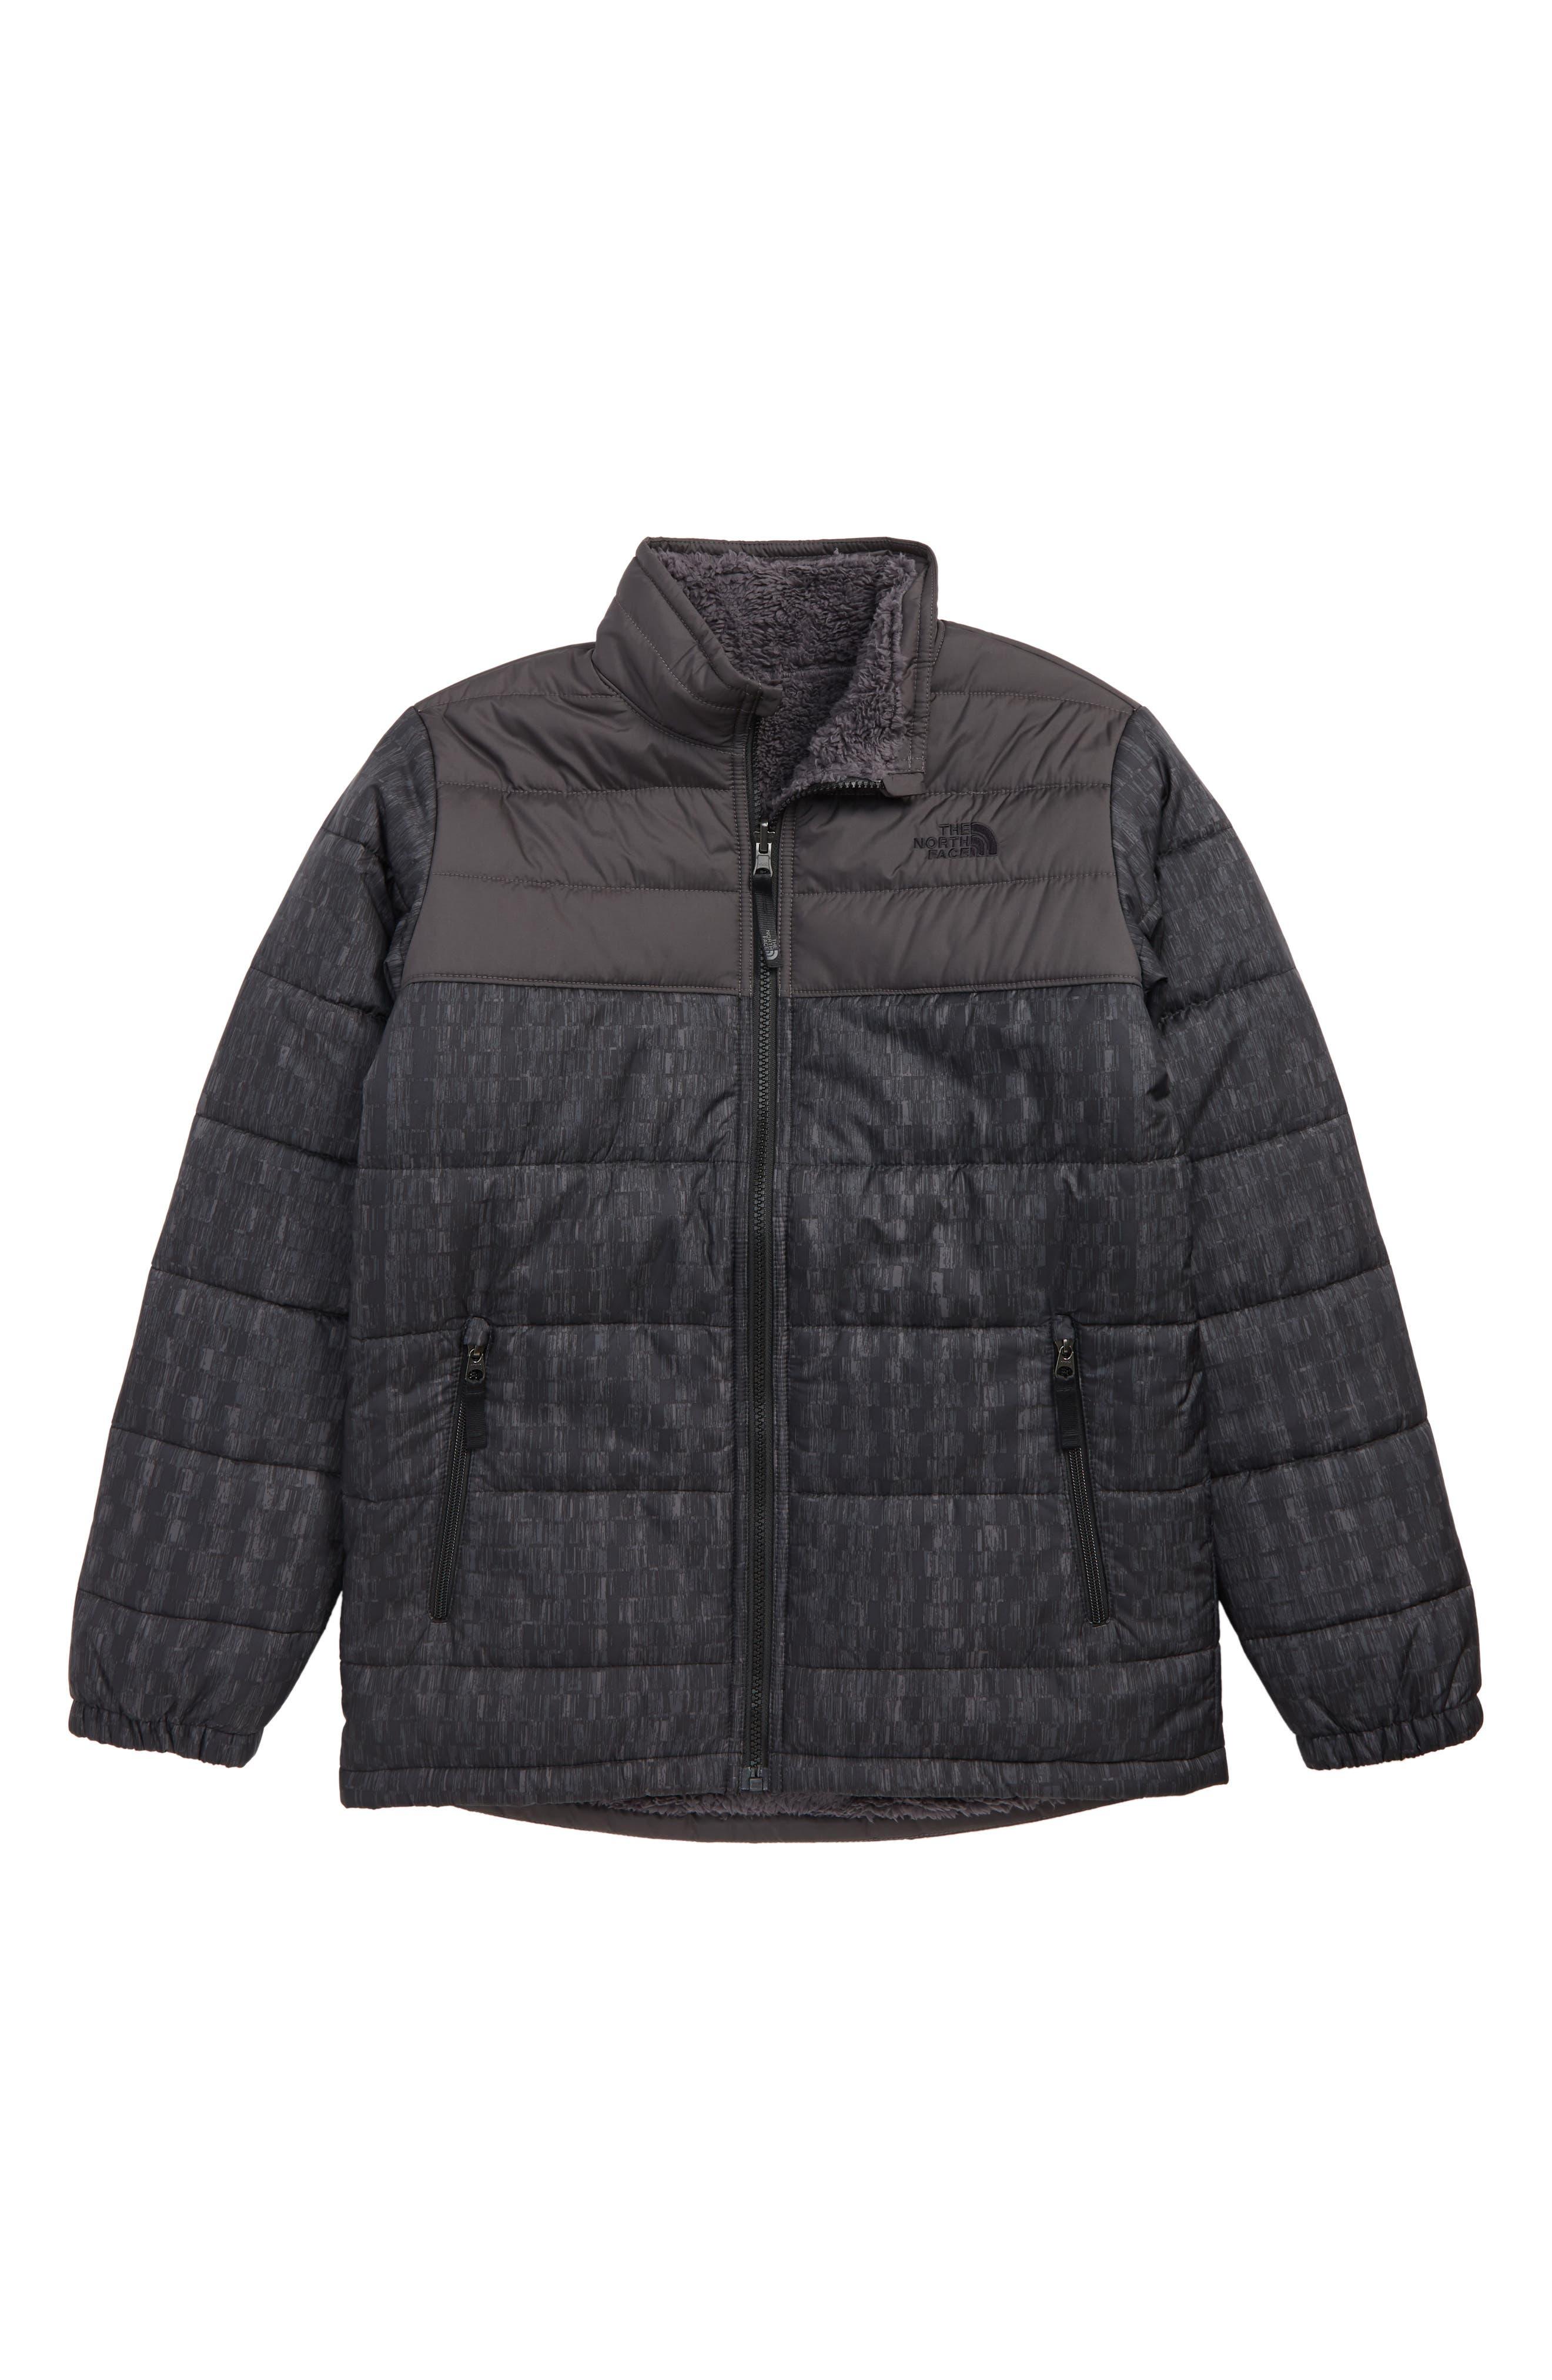 Mount Chimborazo Reversible Jacket,                         Main,                         color, TNF BLACK CHECKER PRINT